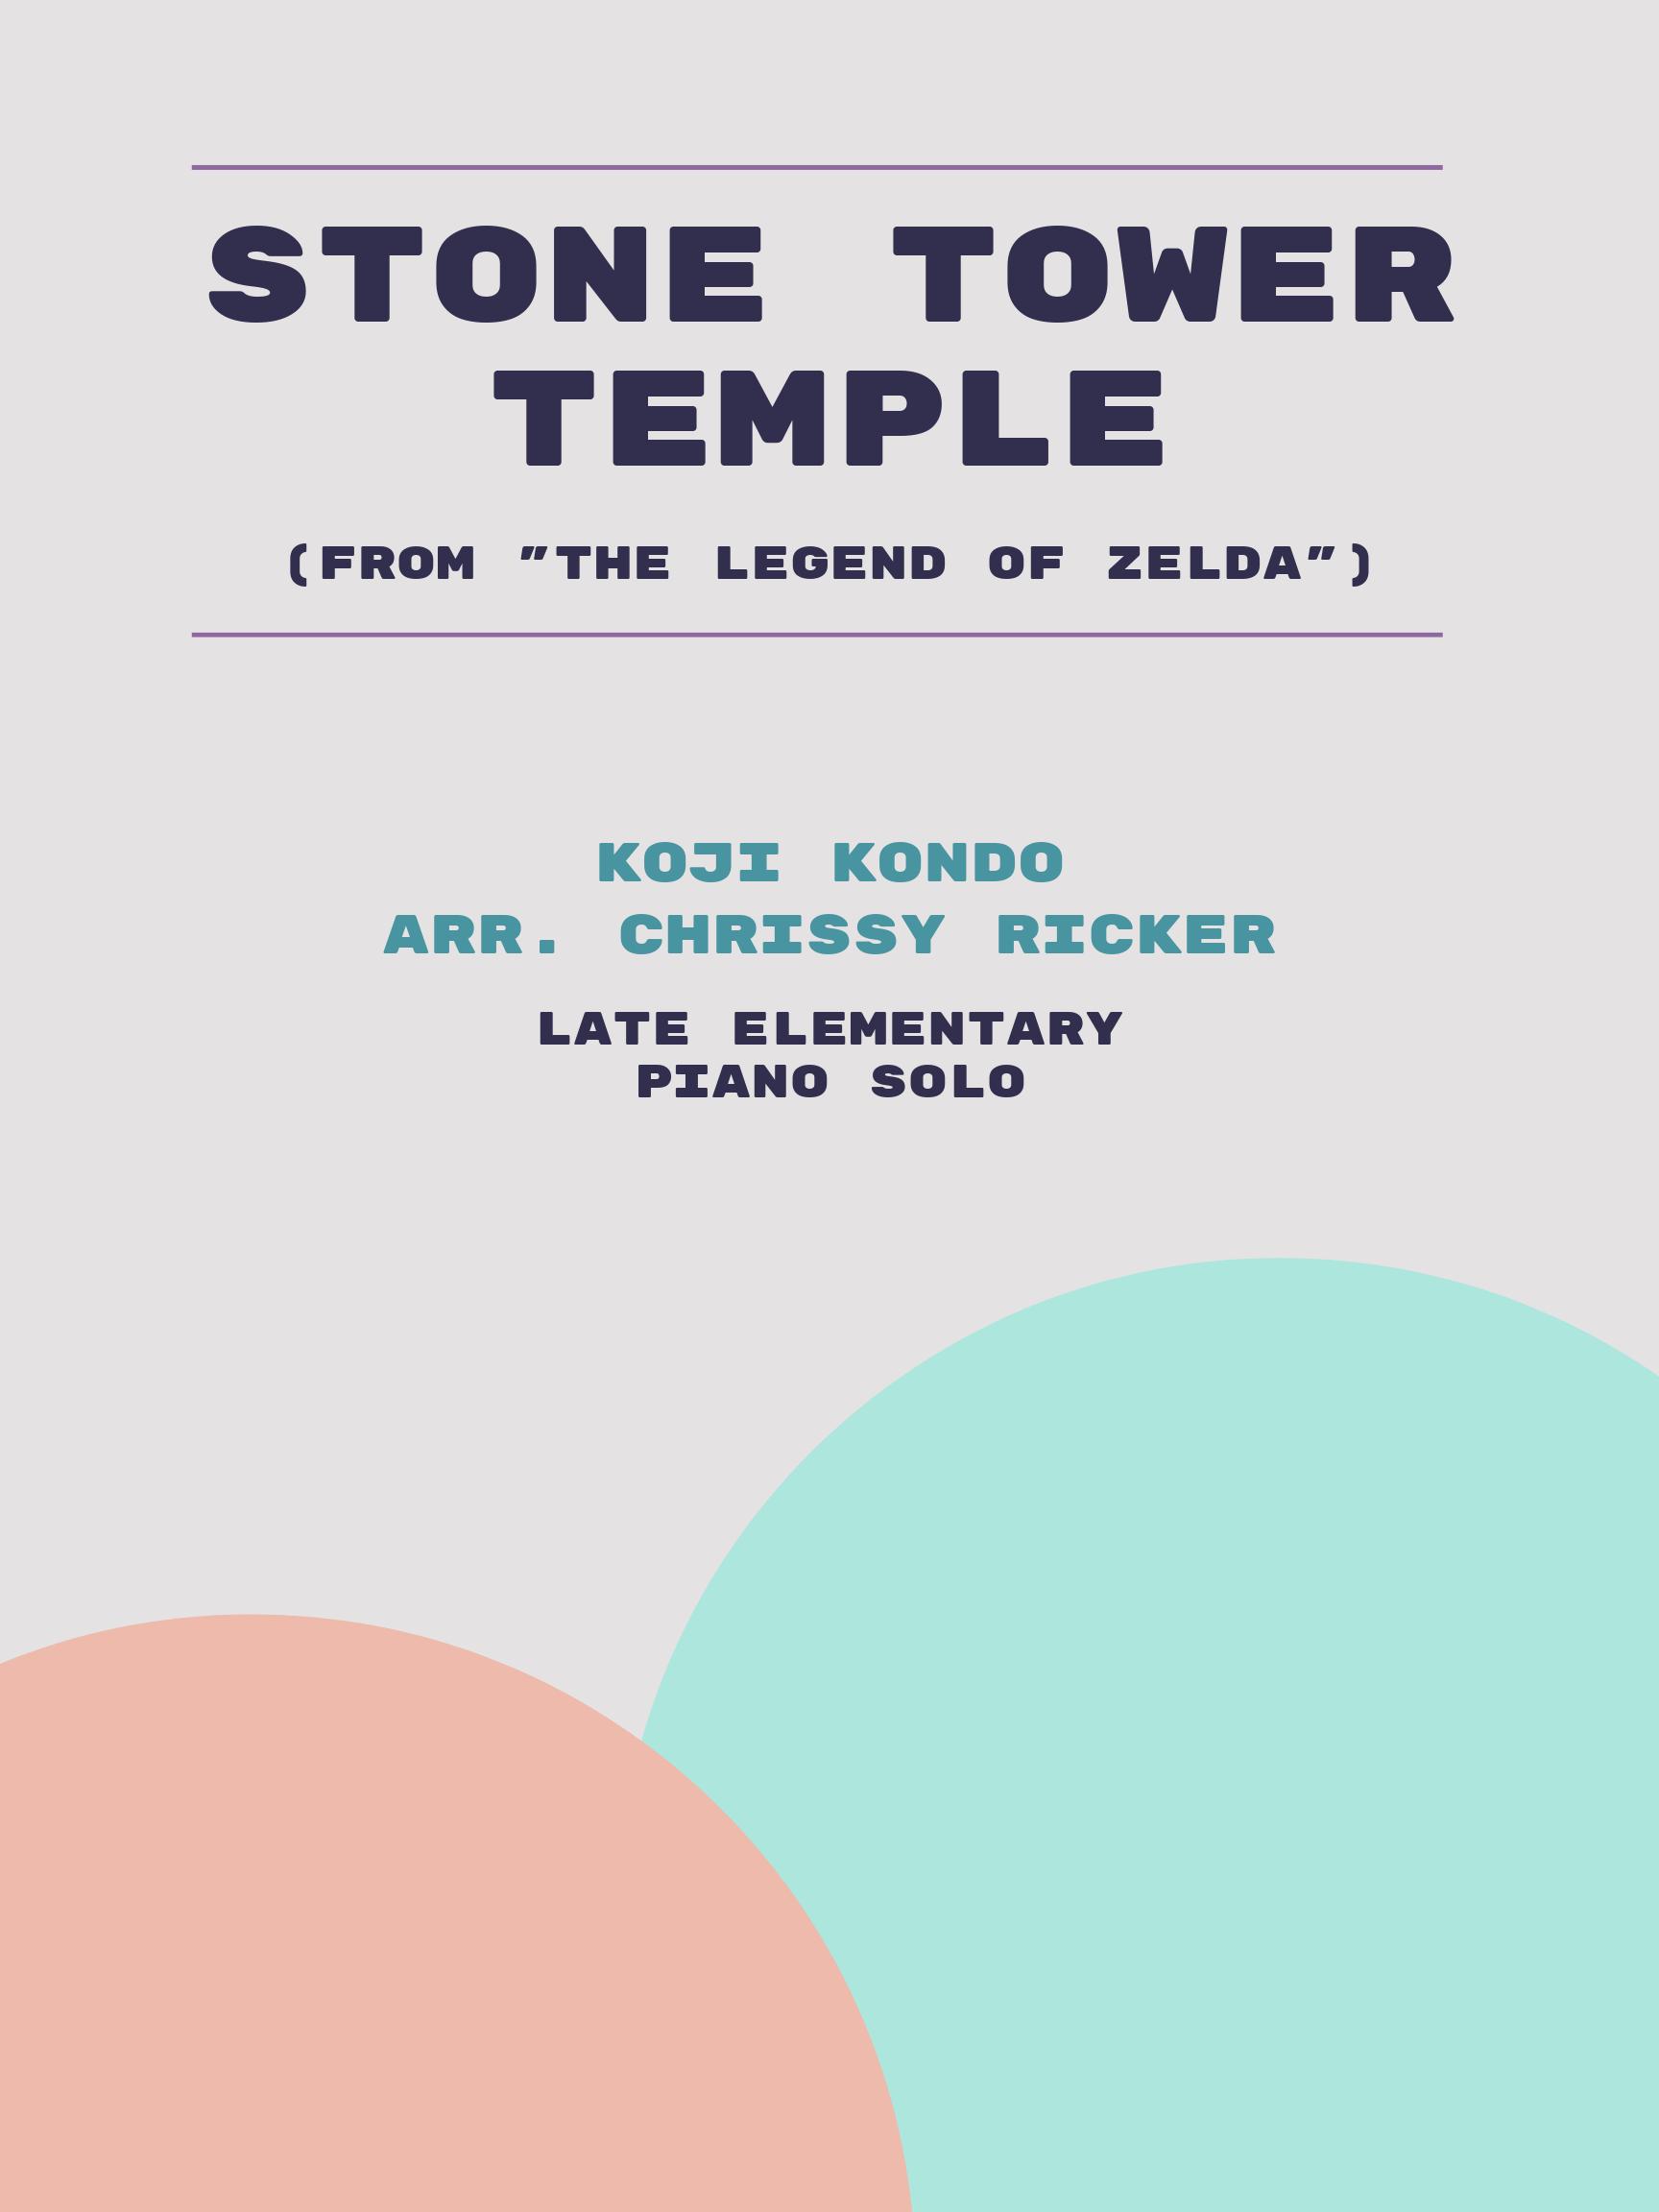 Stone Tower Temple by Koji Kondo